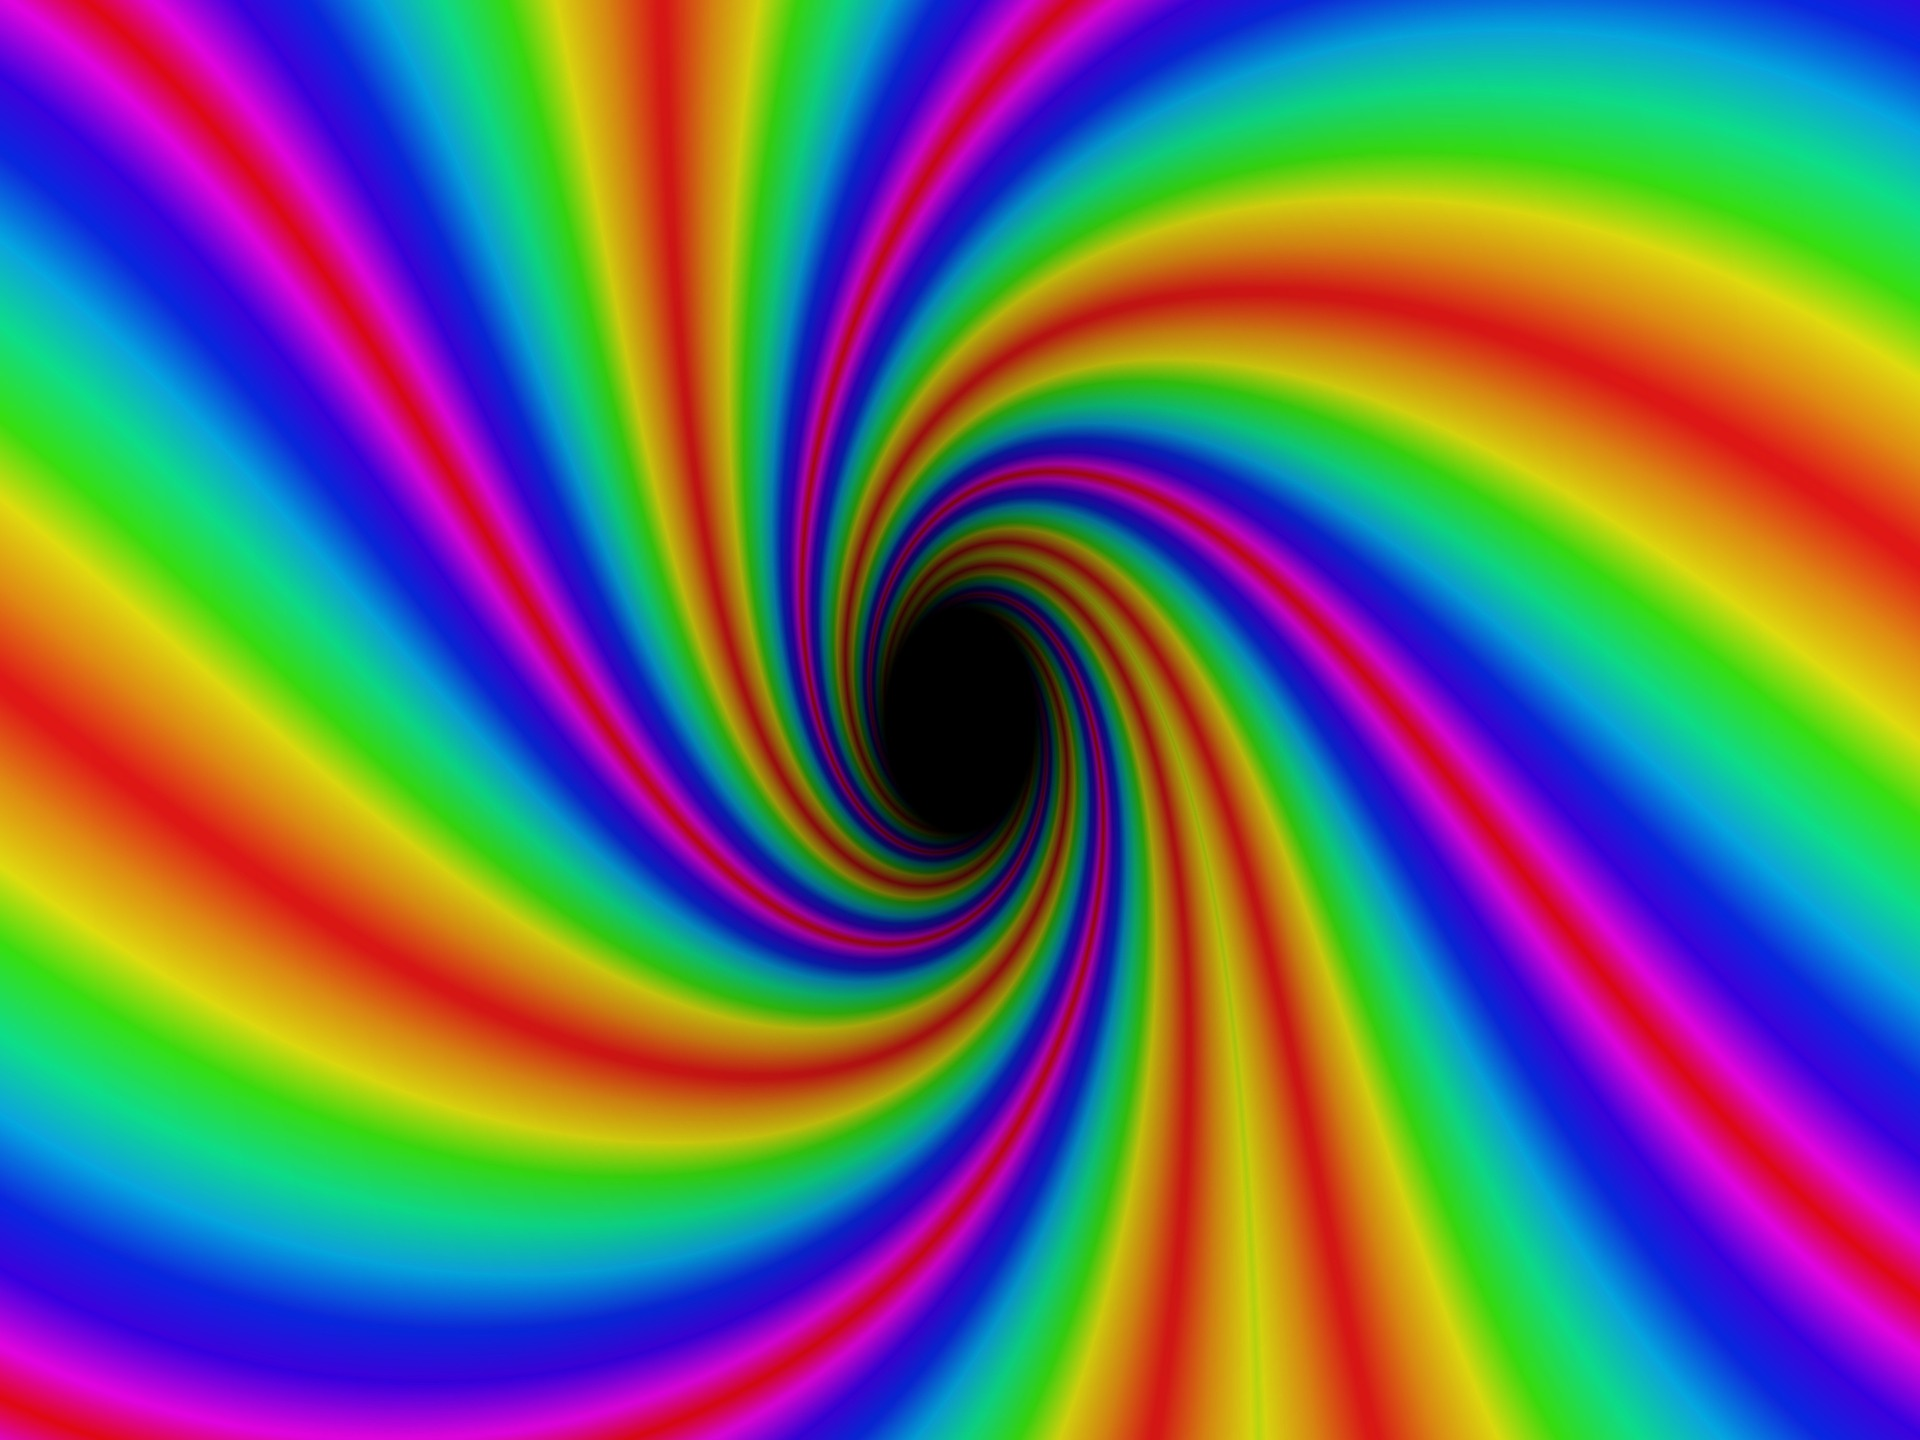 rainbow-882859_1920